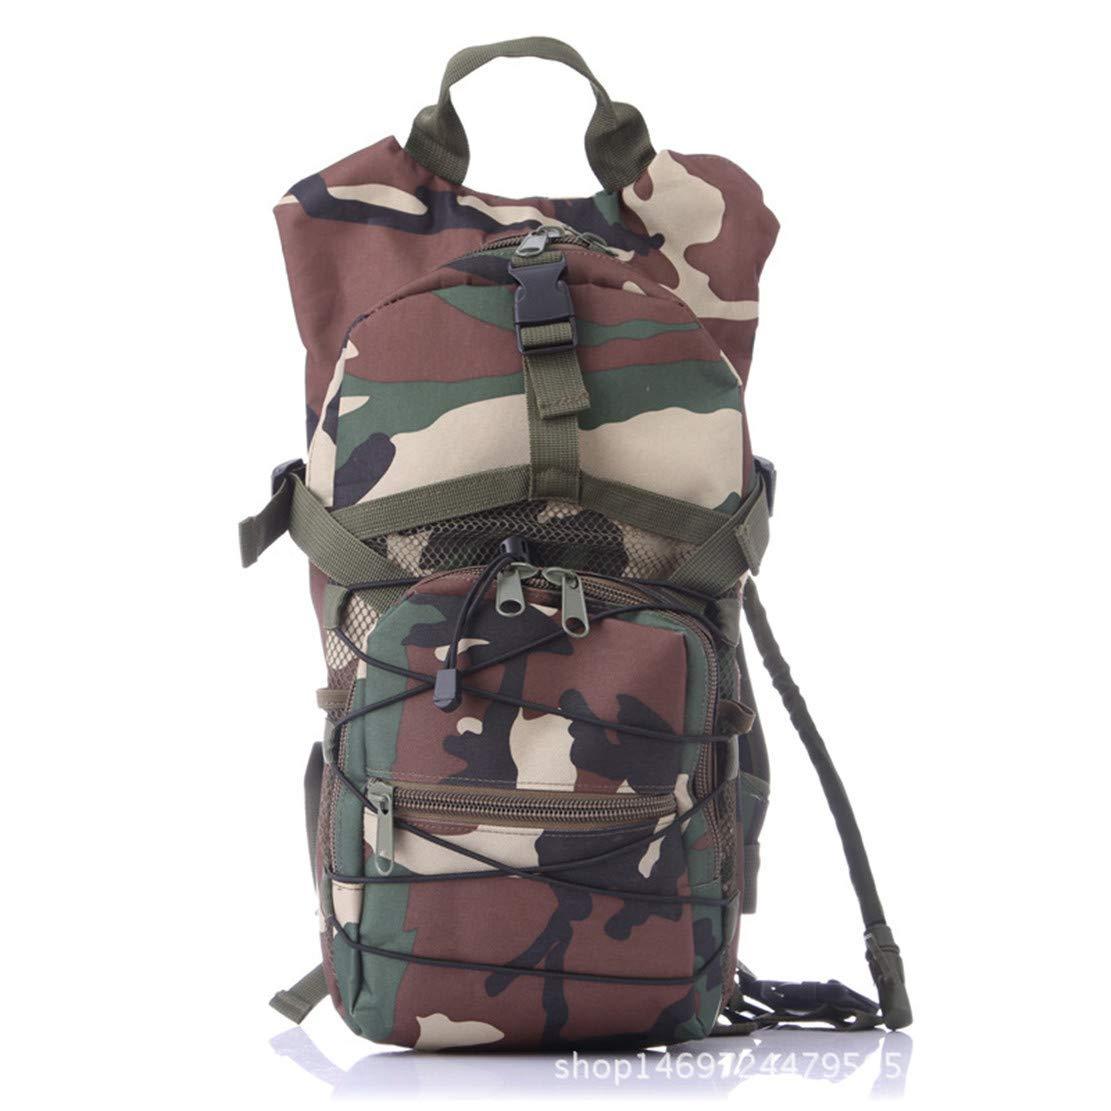 Skudy Unisex Reise Reise Reise Rucksack Camouflage Backpack Wasserdicht Reiserucksack Military Schultasche Outdoor Daypacks Groß Sportrucksack B07L85D64K Daypacks Verrückter Preis acc580